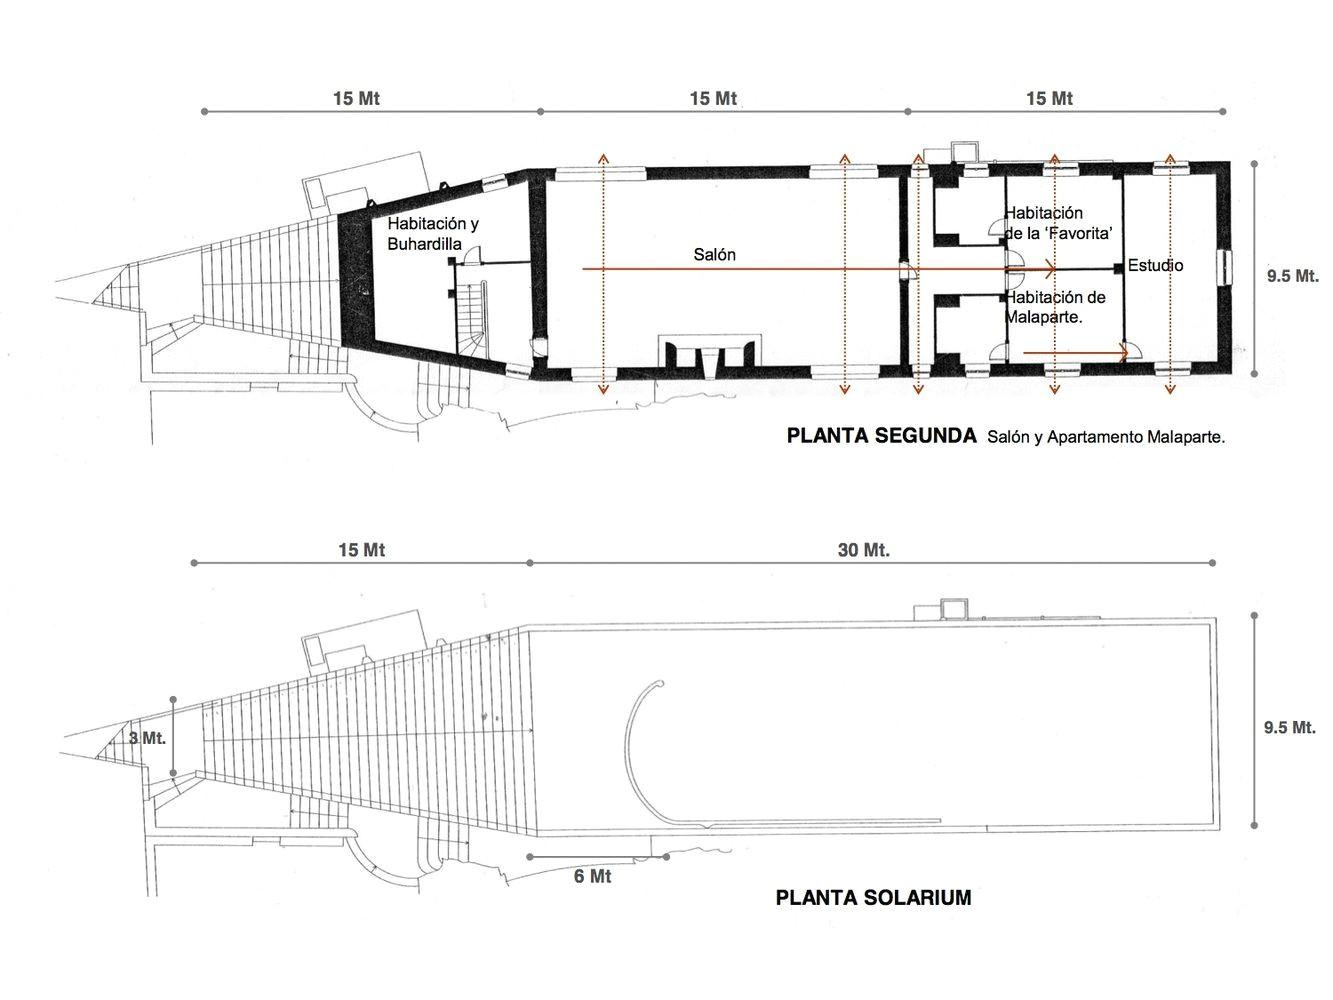 ad classics villa malaparte plan level 2 and solarium image a c gloria saravia ortiz phd arquitecta upc barcelona espaa a academica escuela de arquitectura